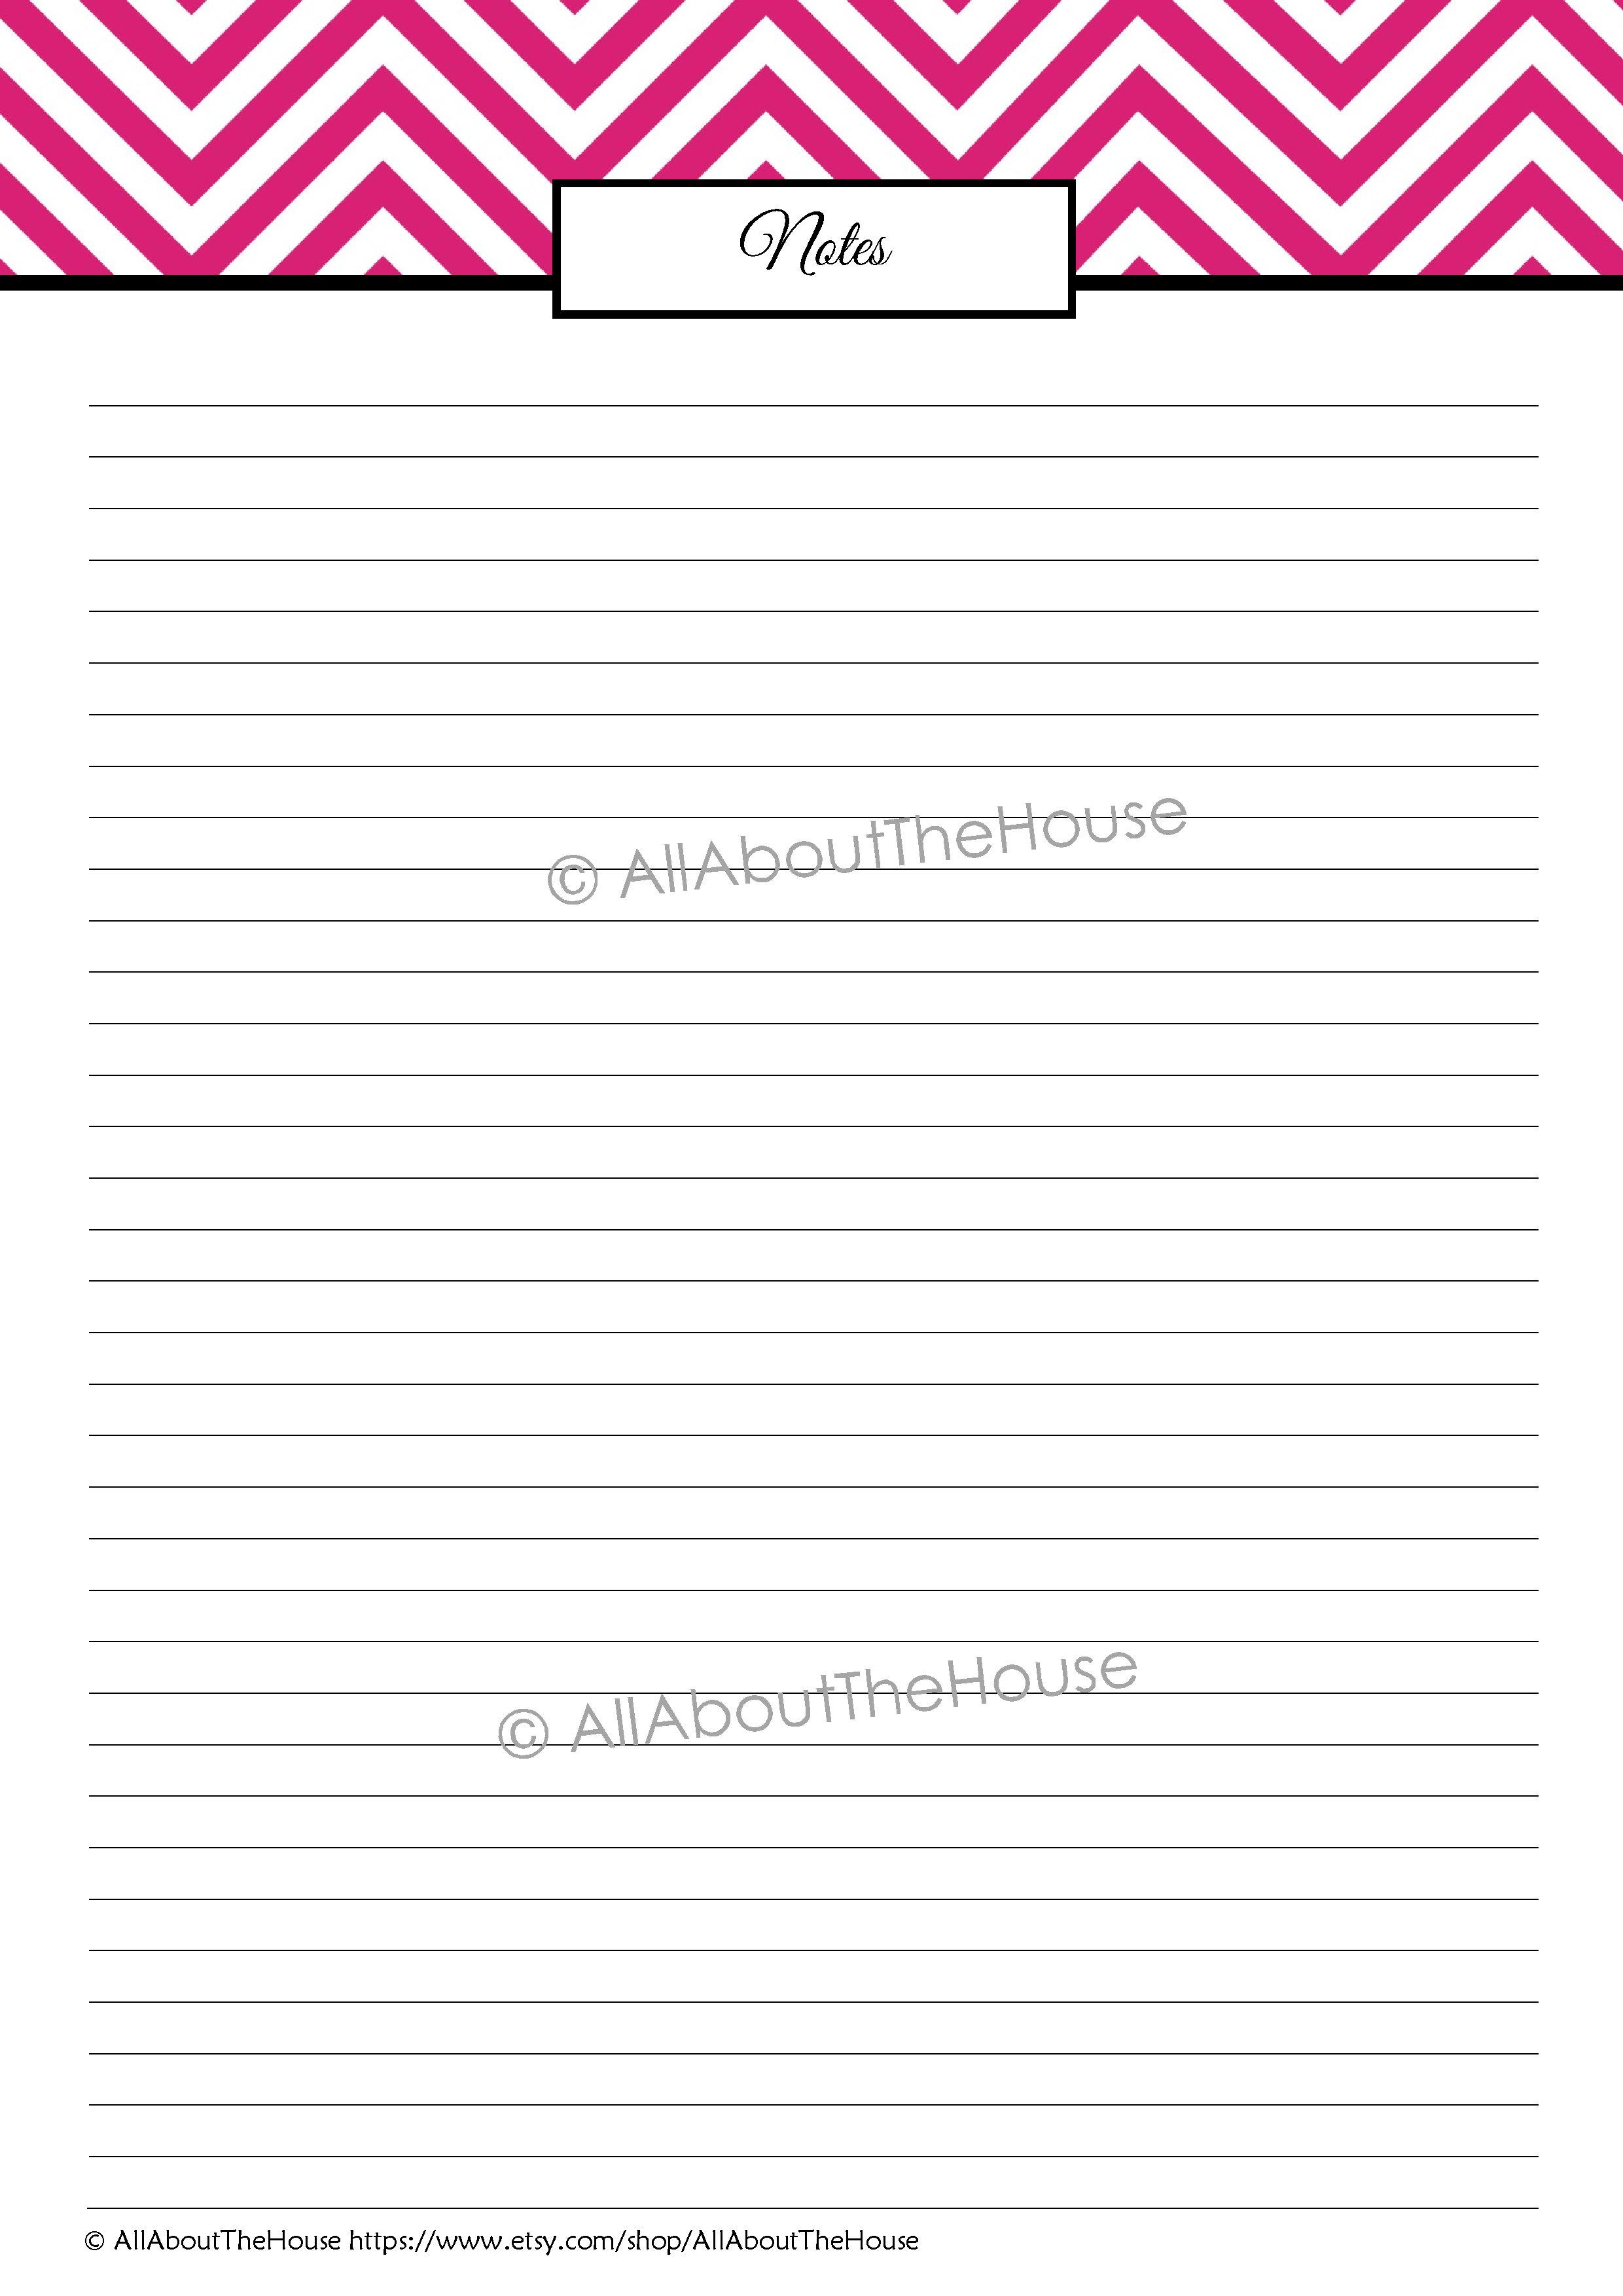 Print notes history of printing and